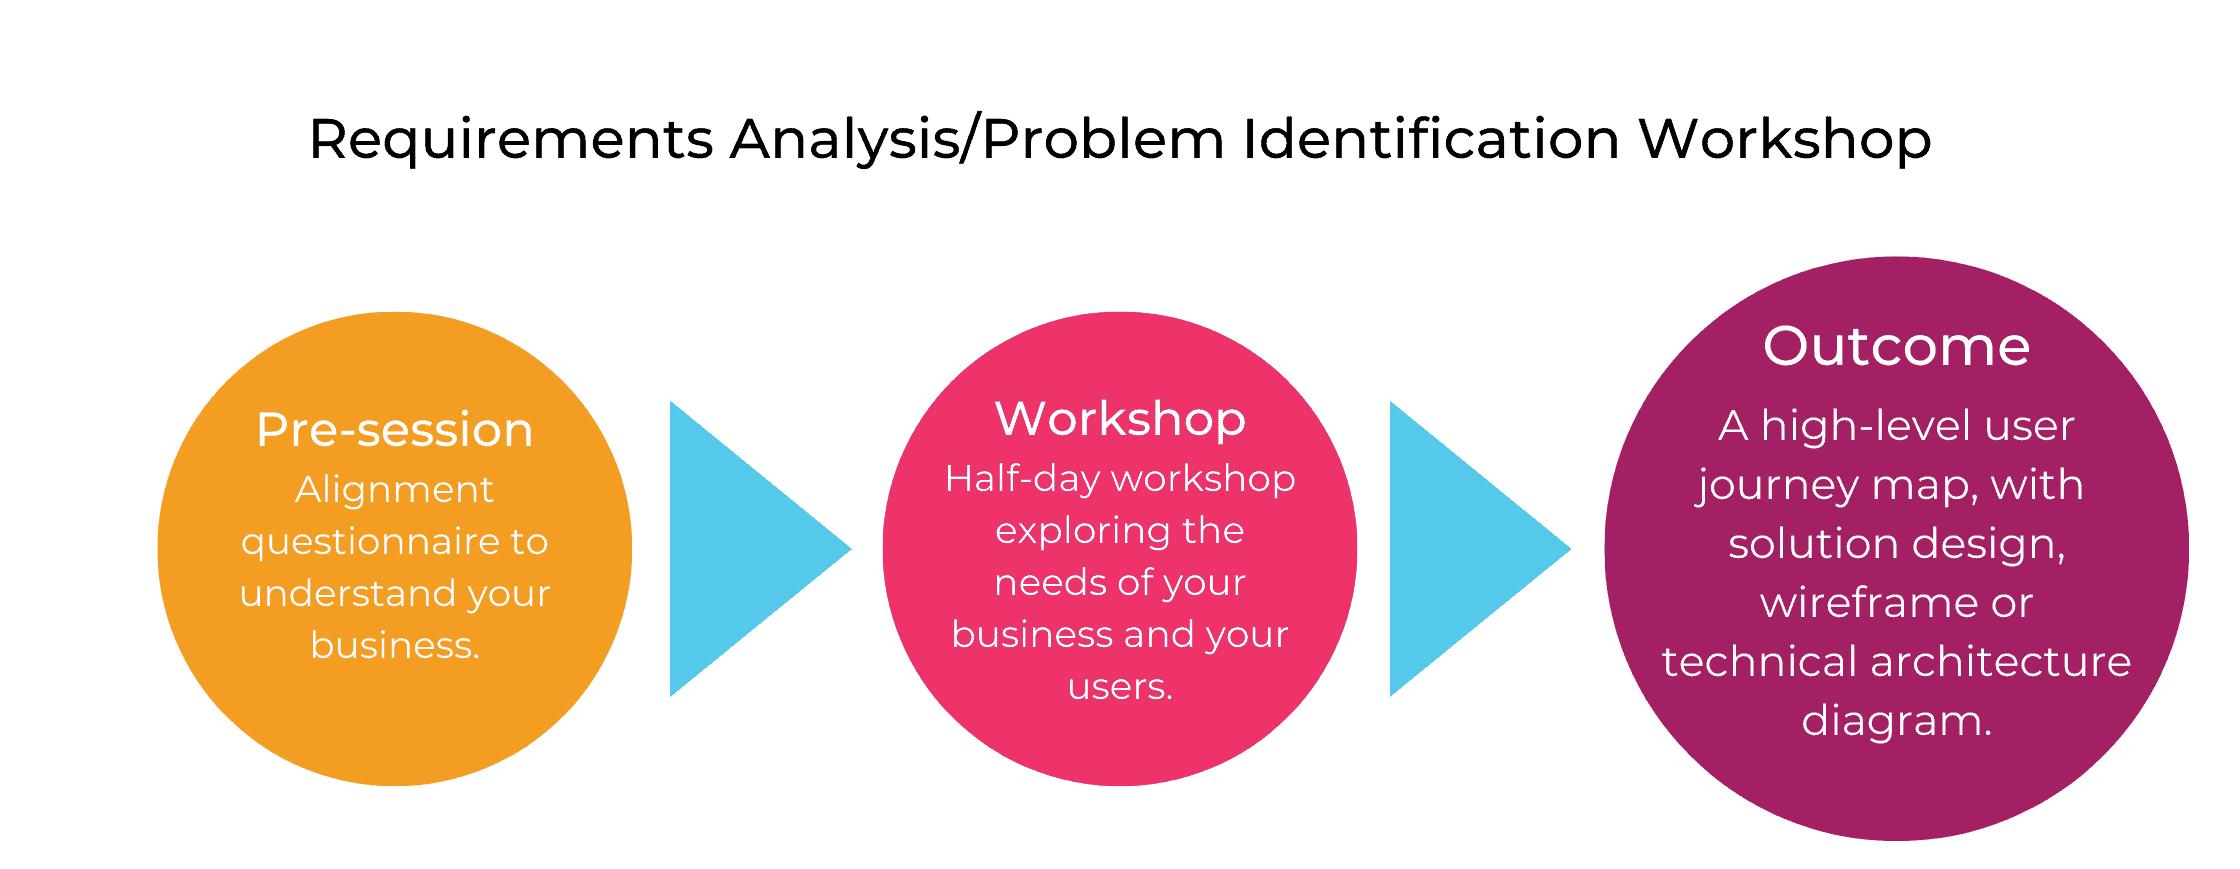 Problem identification workshop